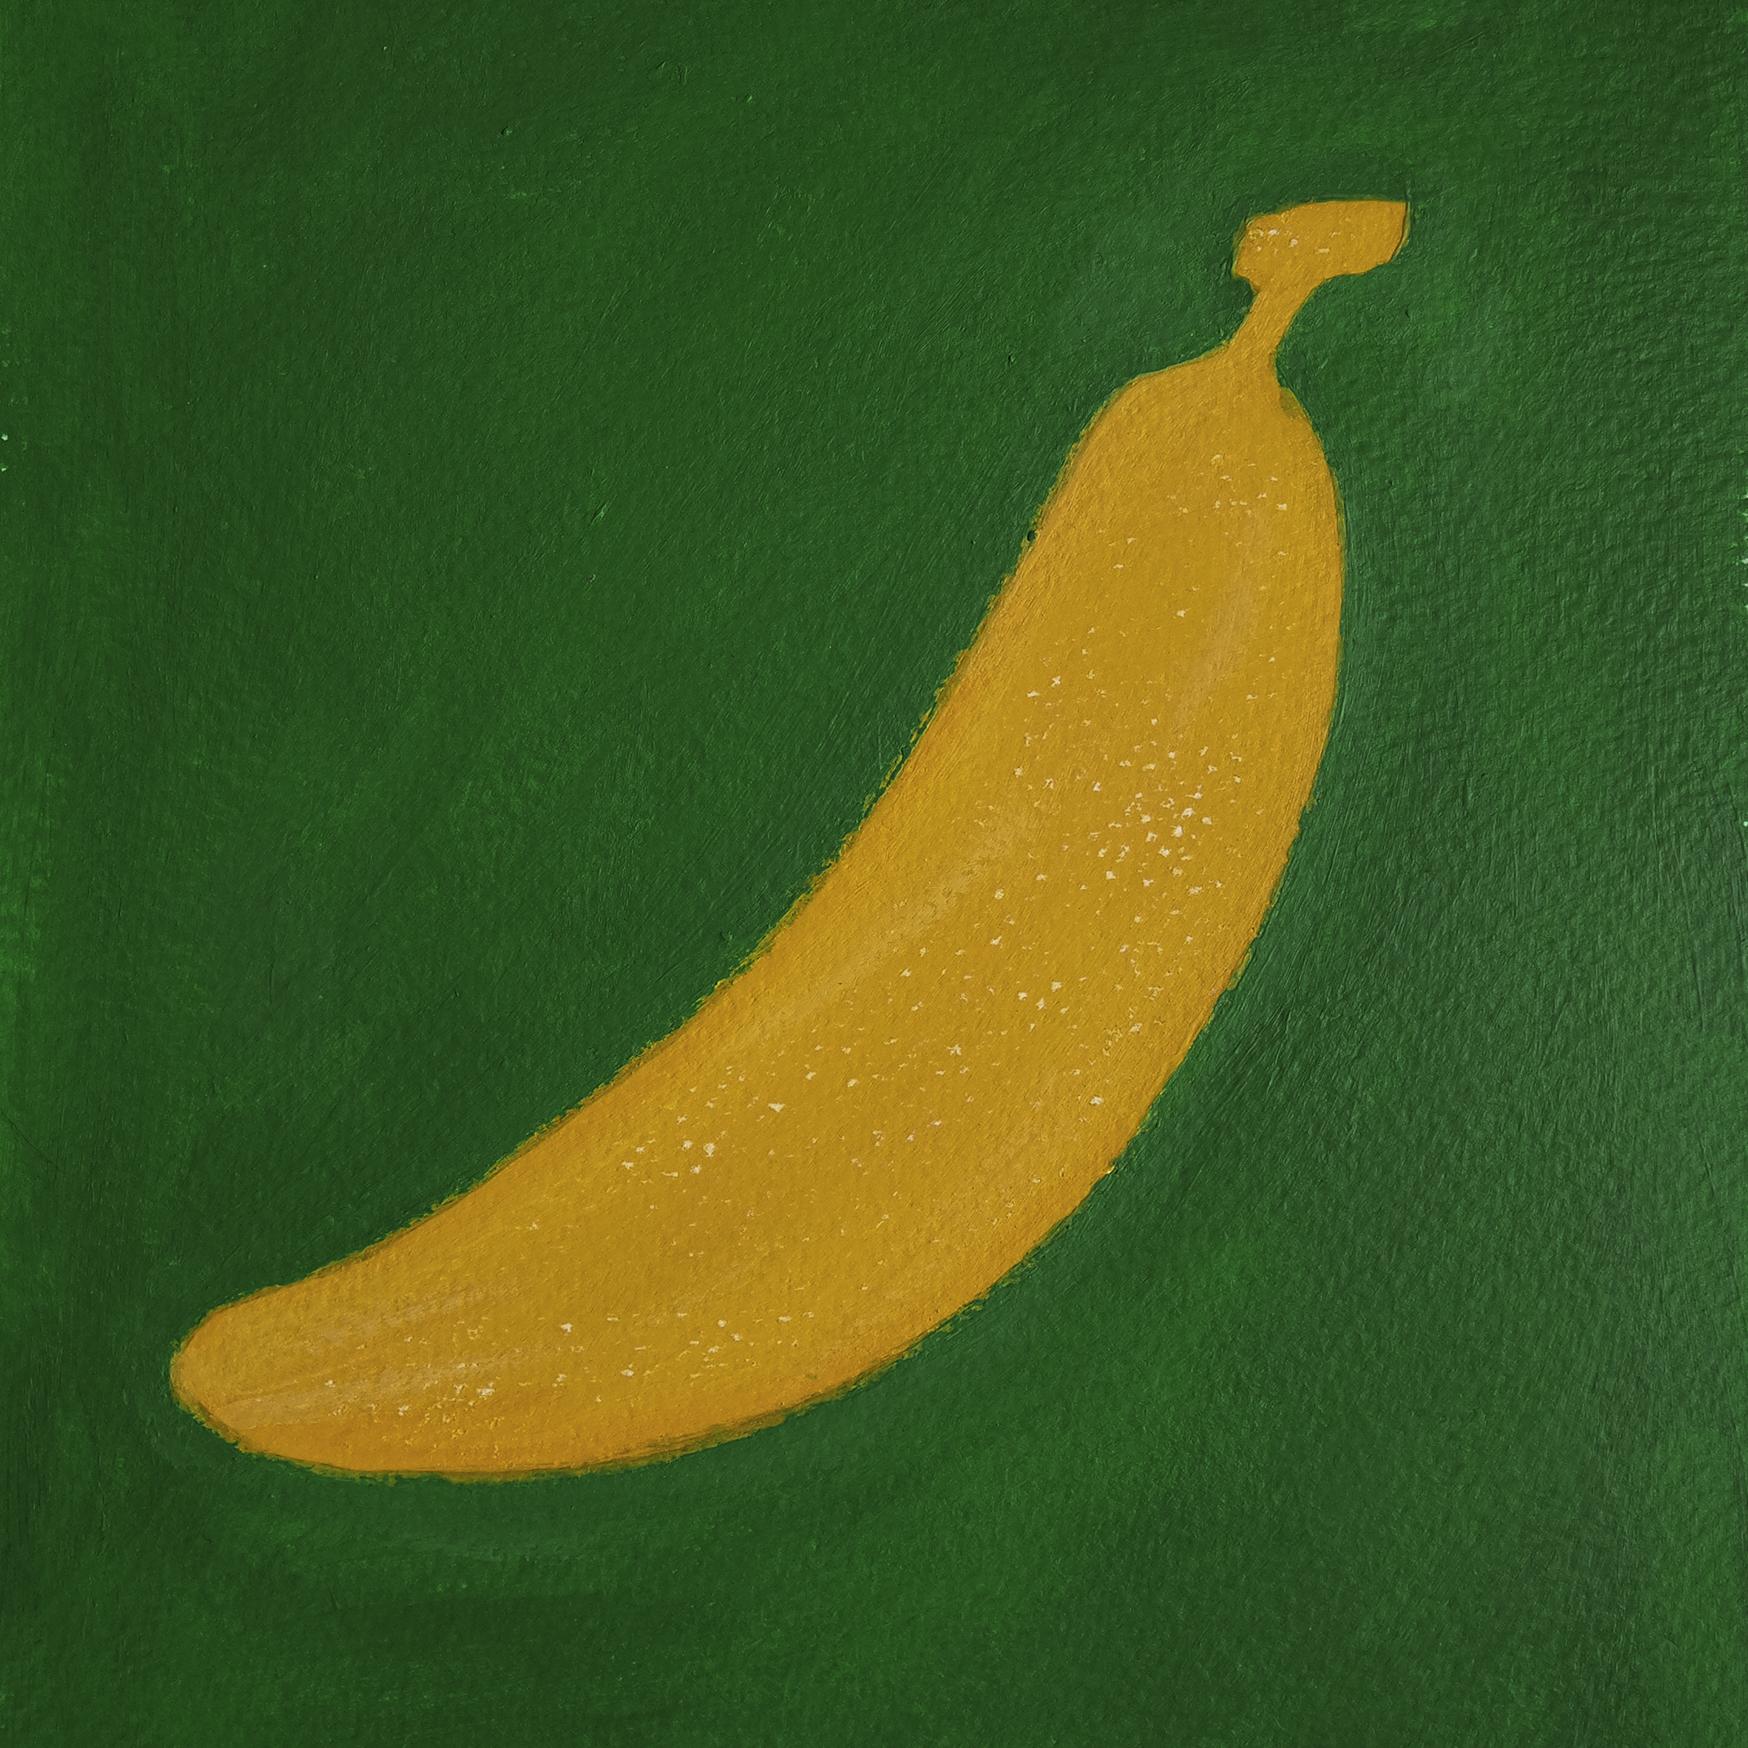 banana111.jpg